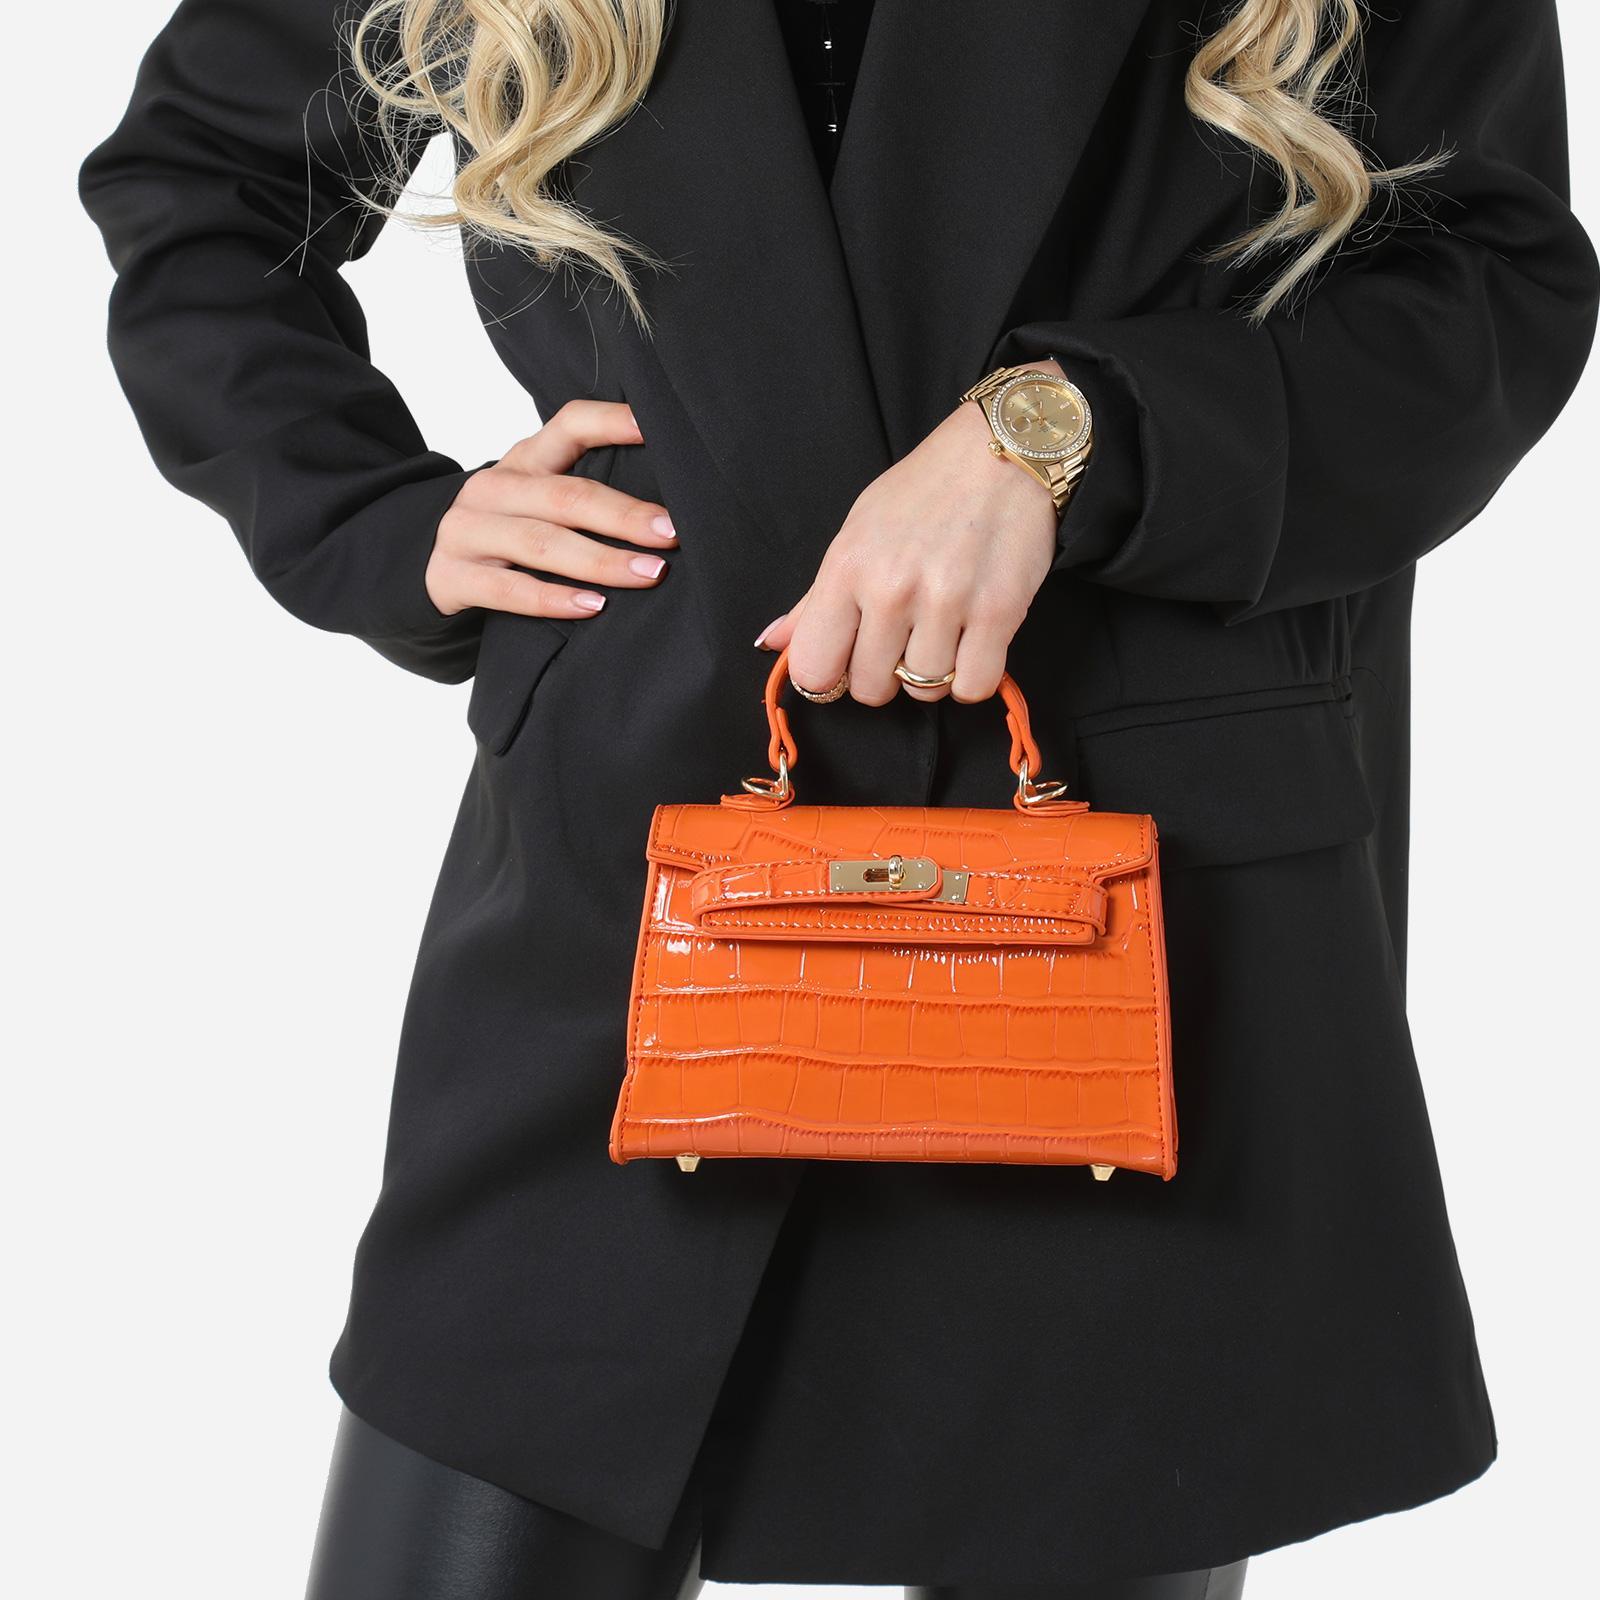 EGO Lock Detail Mini Tote Bag In Orange Croc Print Patent,, Orange  - female - Size: One Size